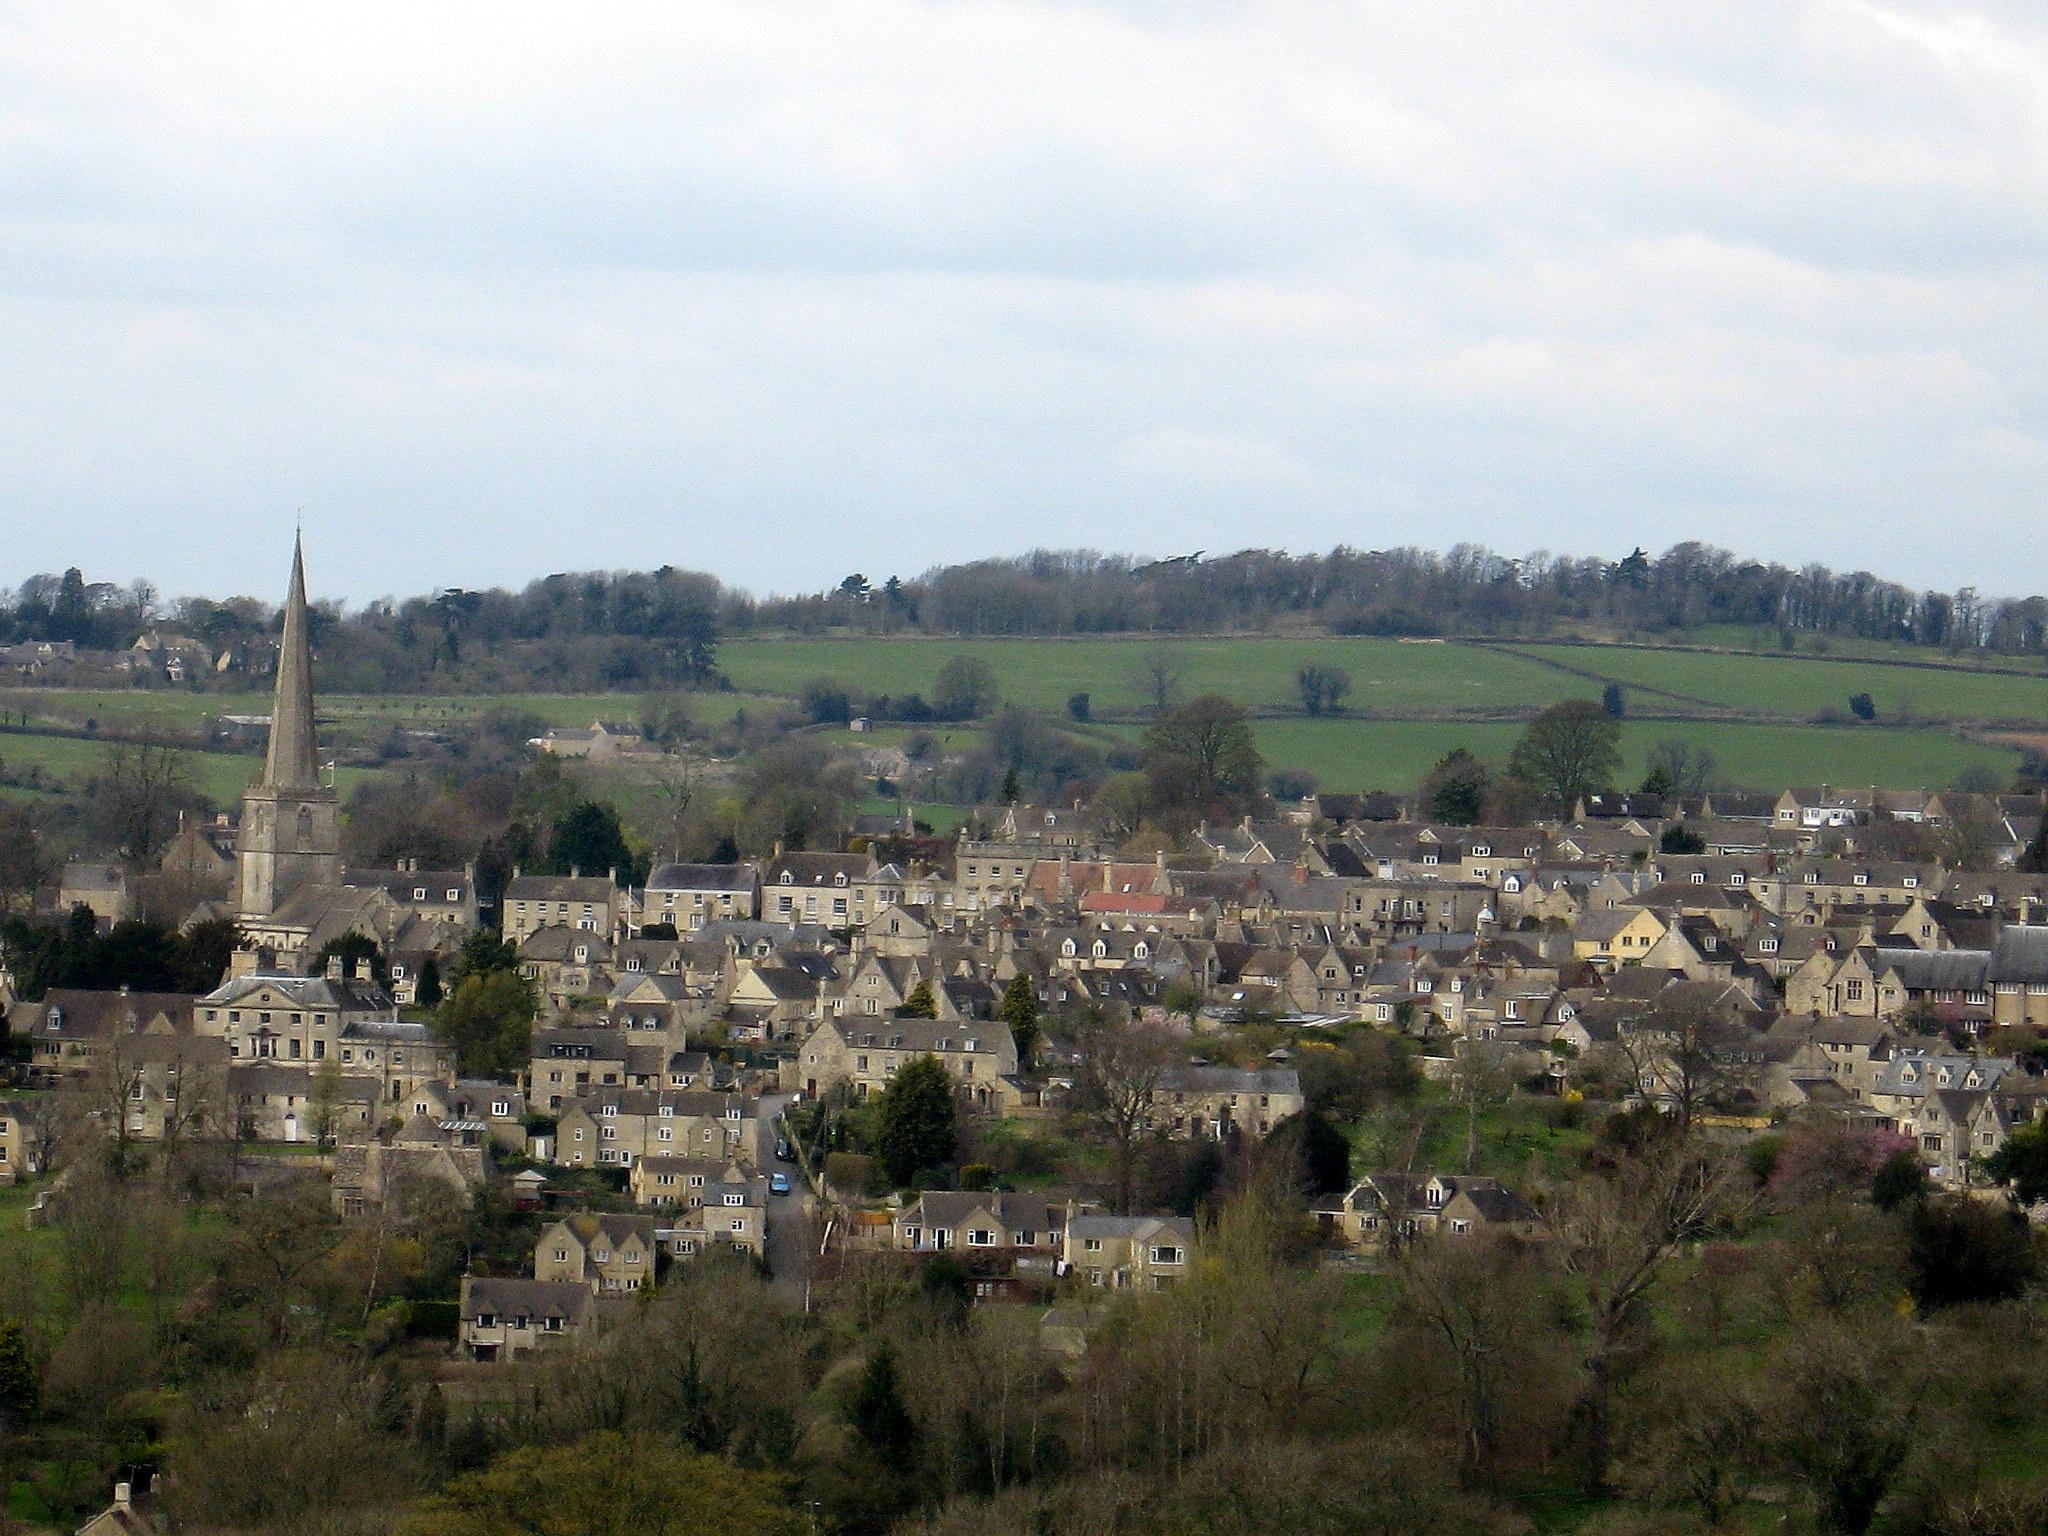 Painswick, Gloucestershire as seen from Longridge, Photo taken in March 2009.